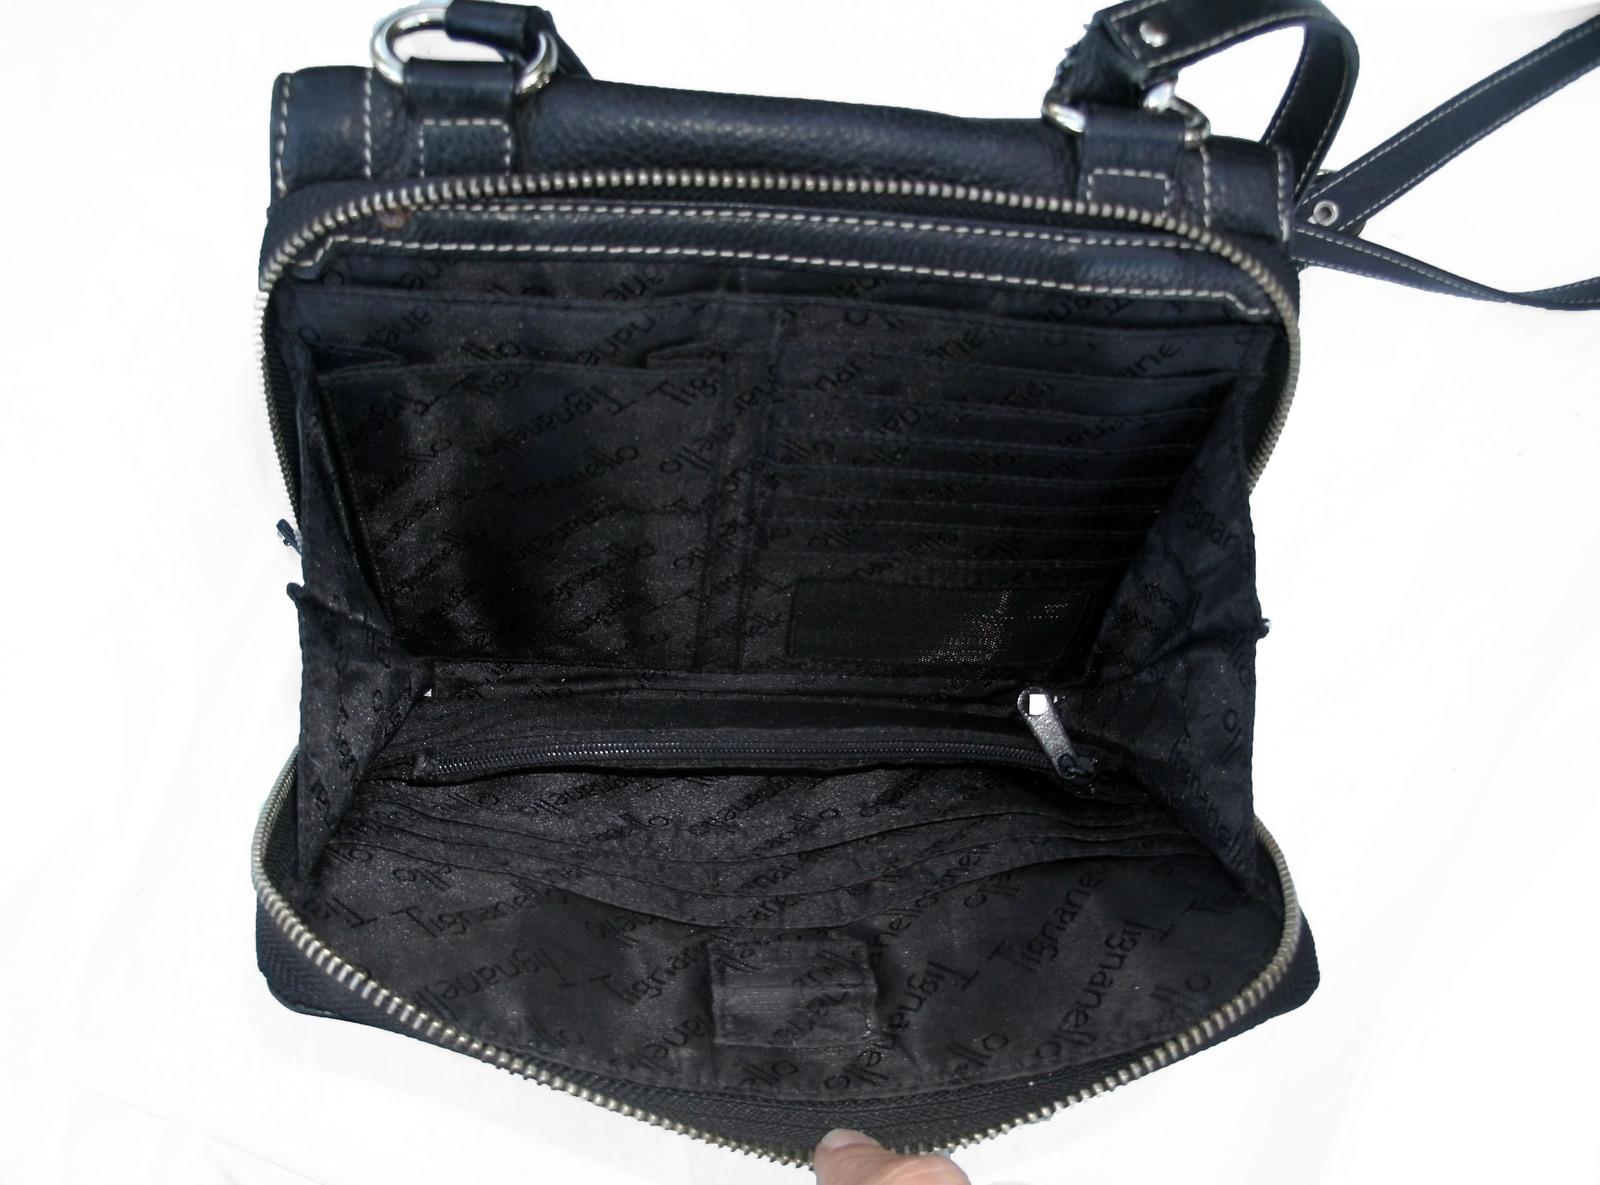 Tignanello Black Pebbled Leather Organizer Crossbody built in Wallet image 12